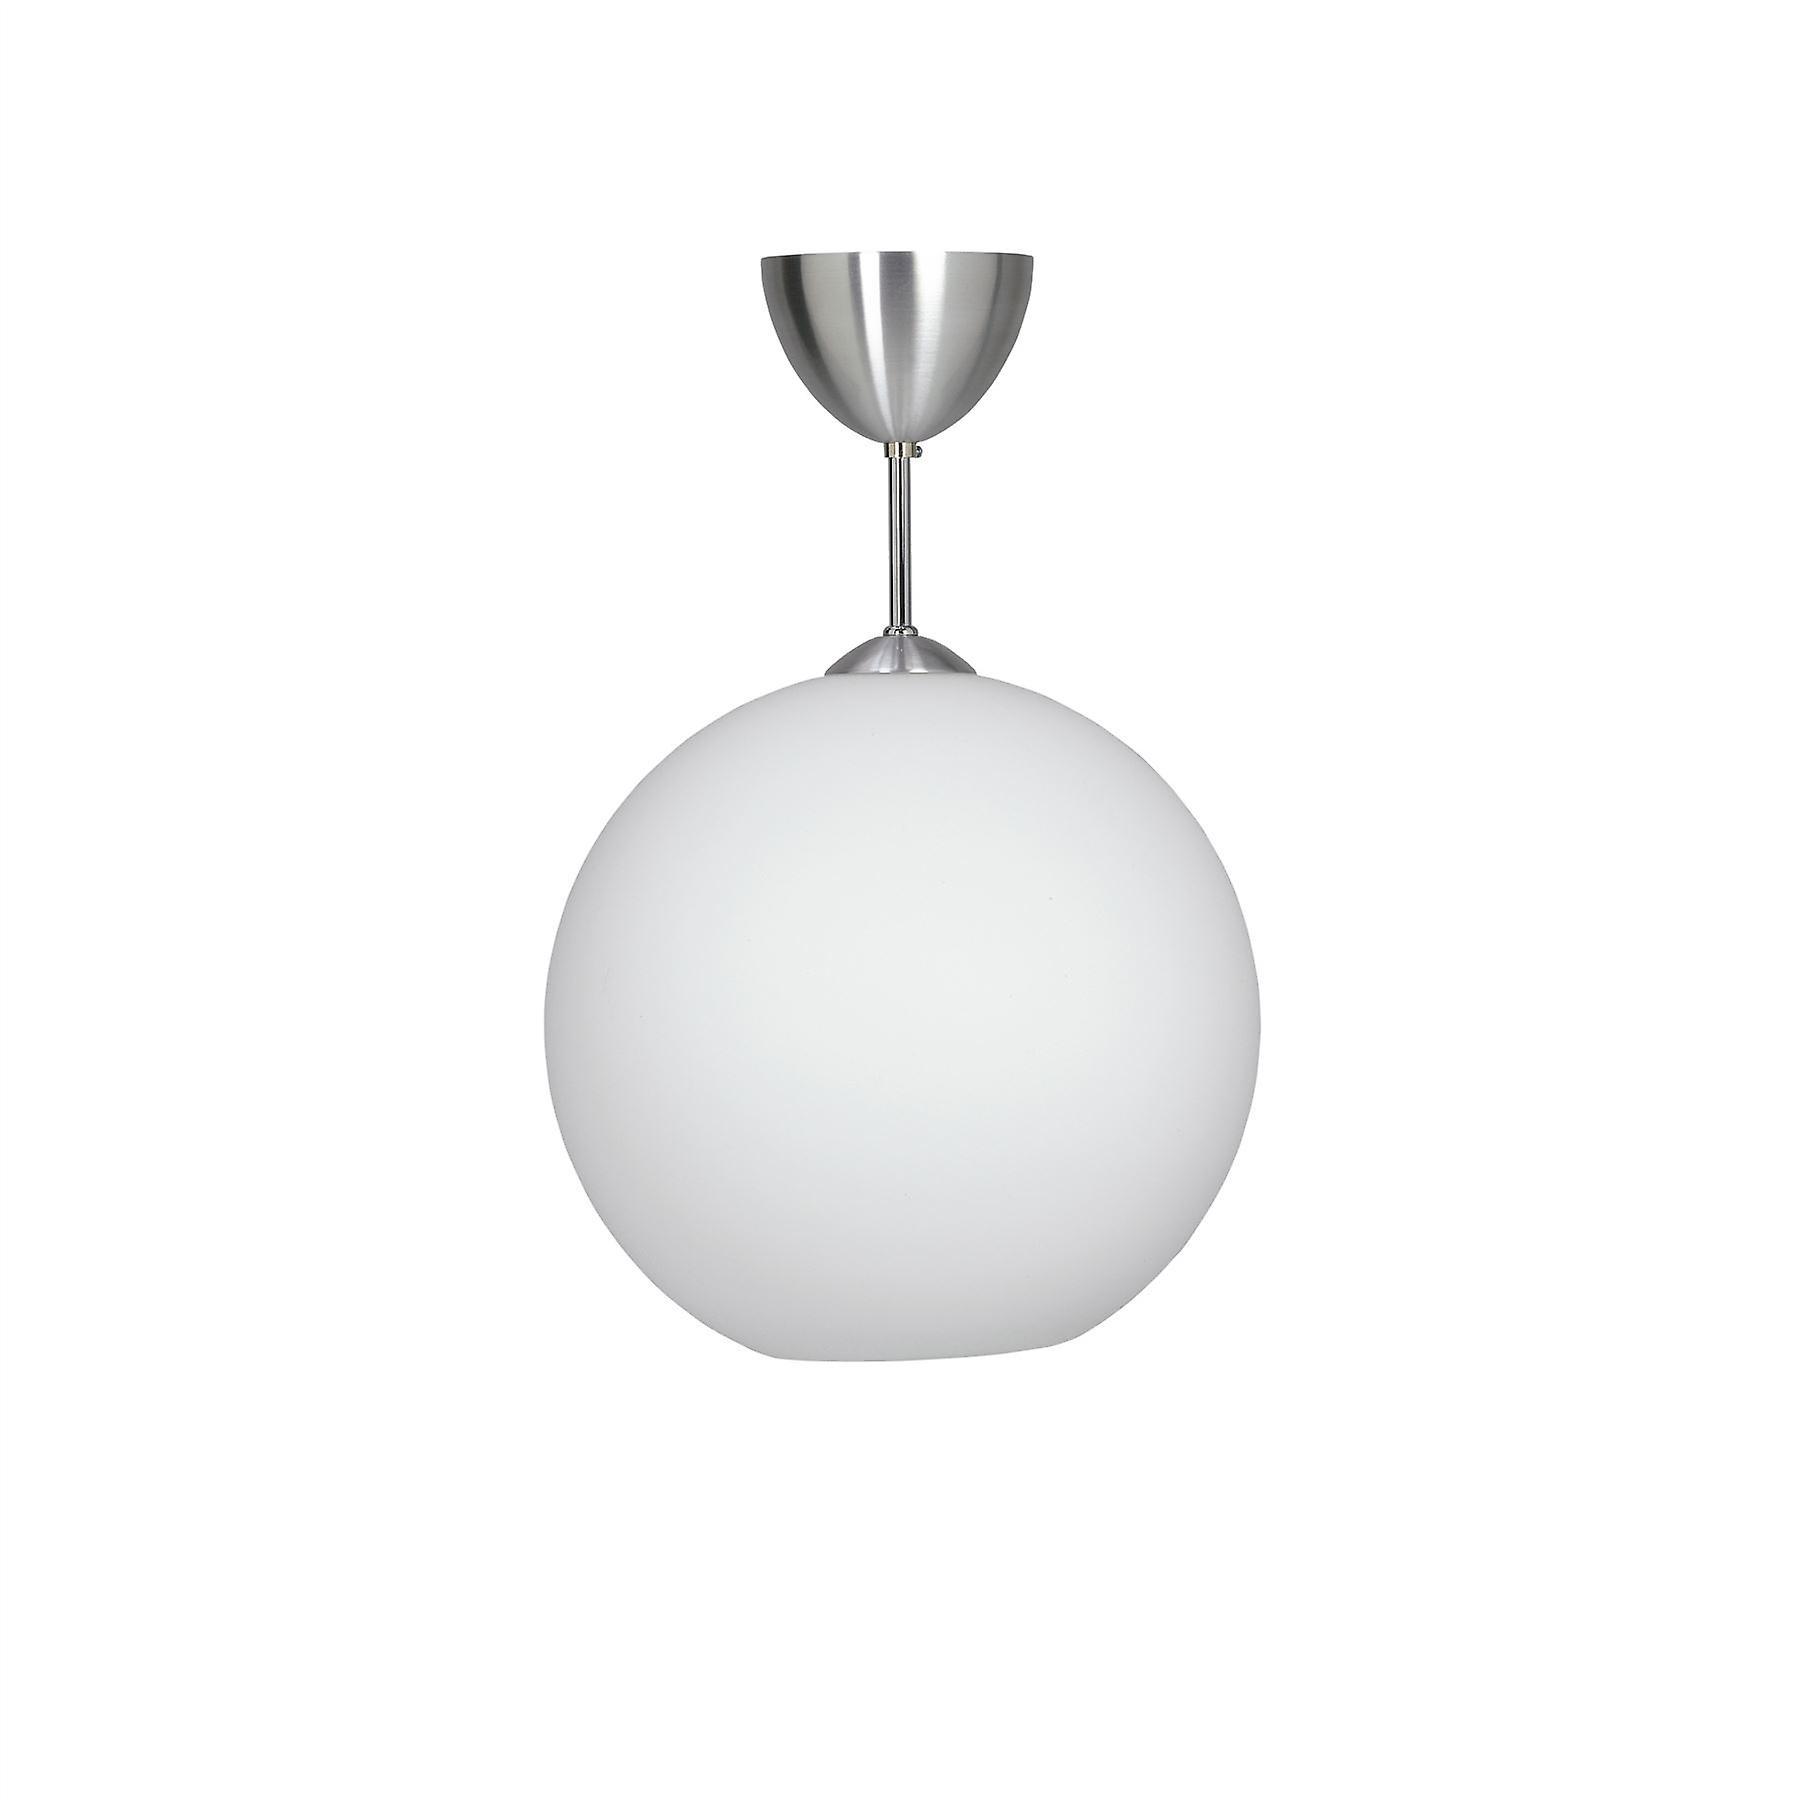 Belid - Capo Flush Ceiling lumière LED Aluminium Finish 236411